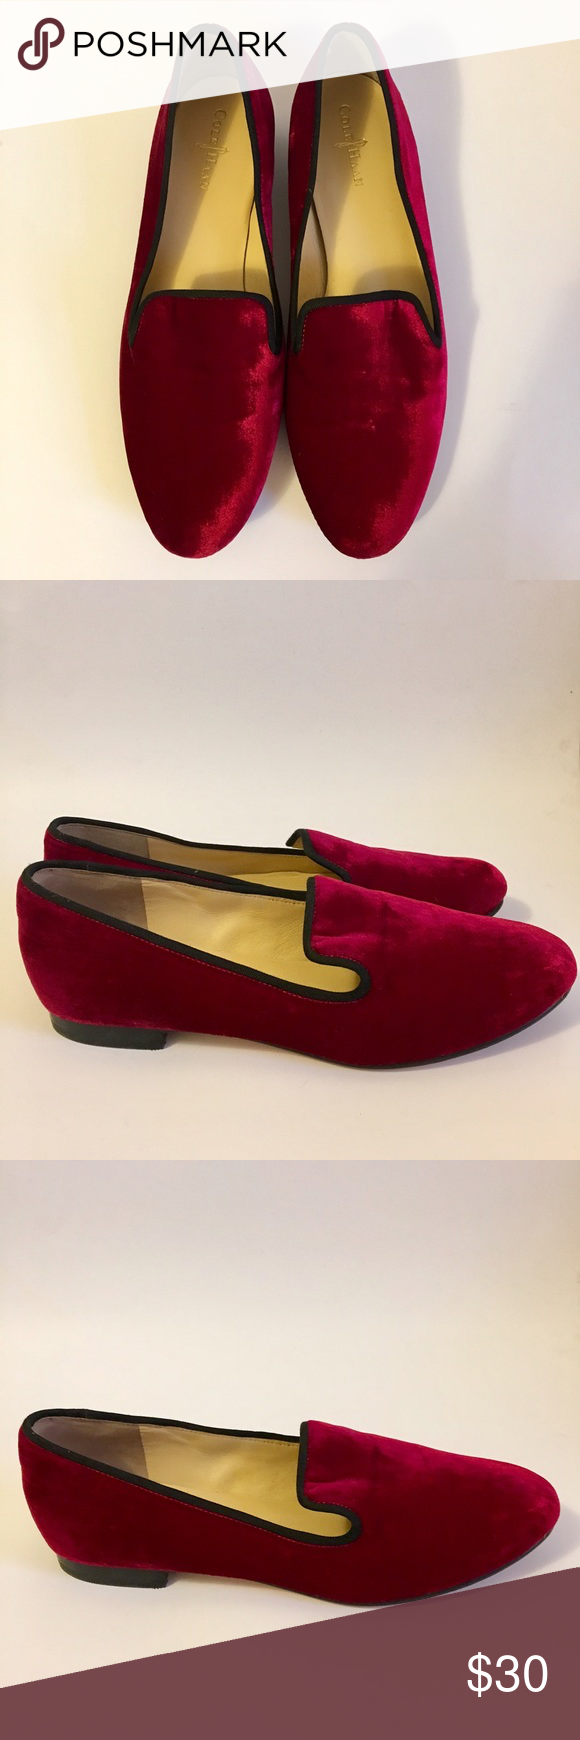 Cole Haan Sabrina Velvet Loafers